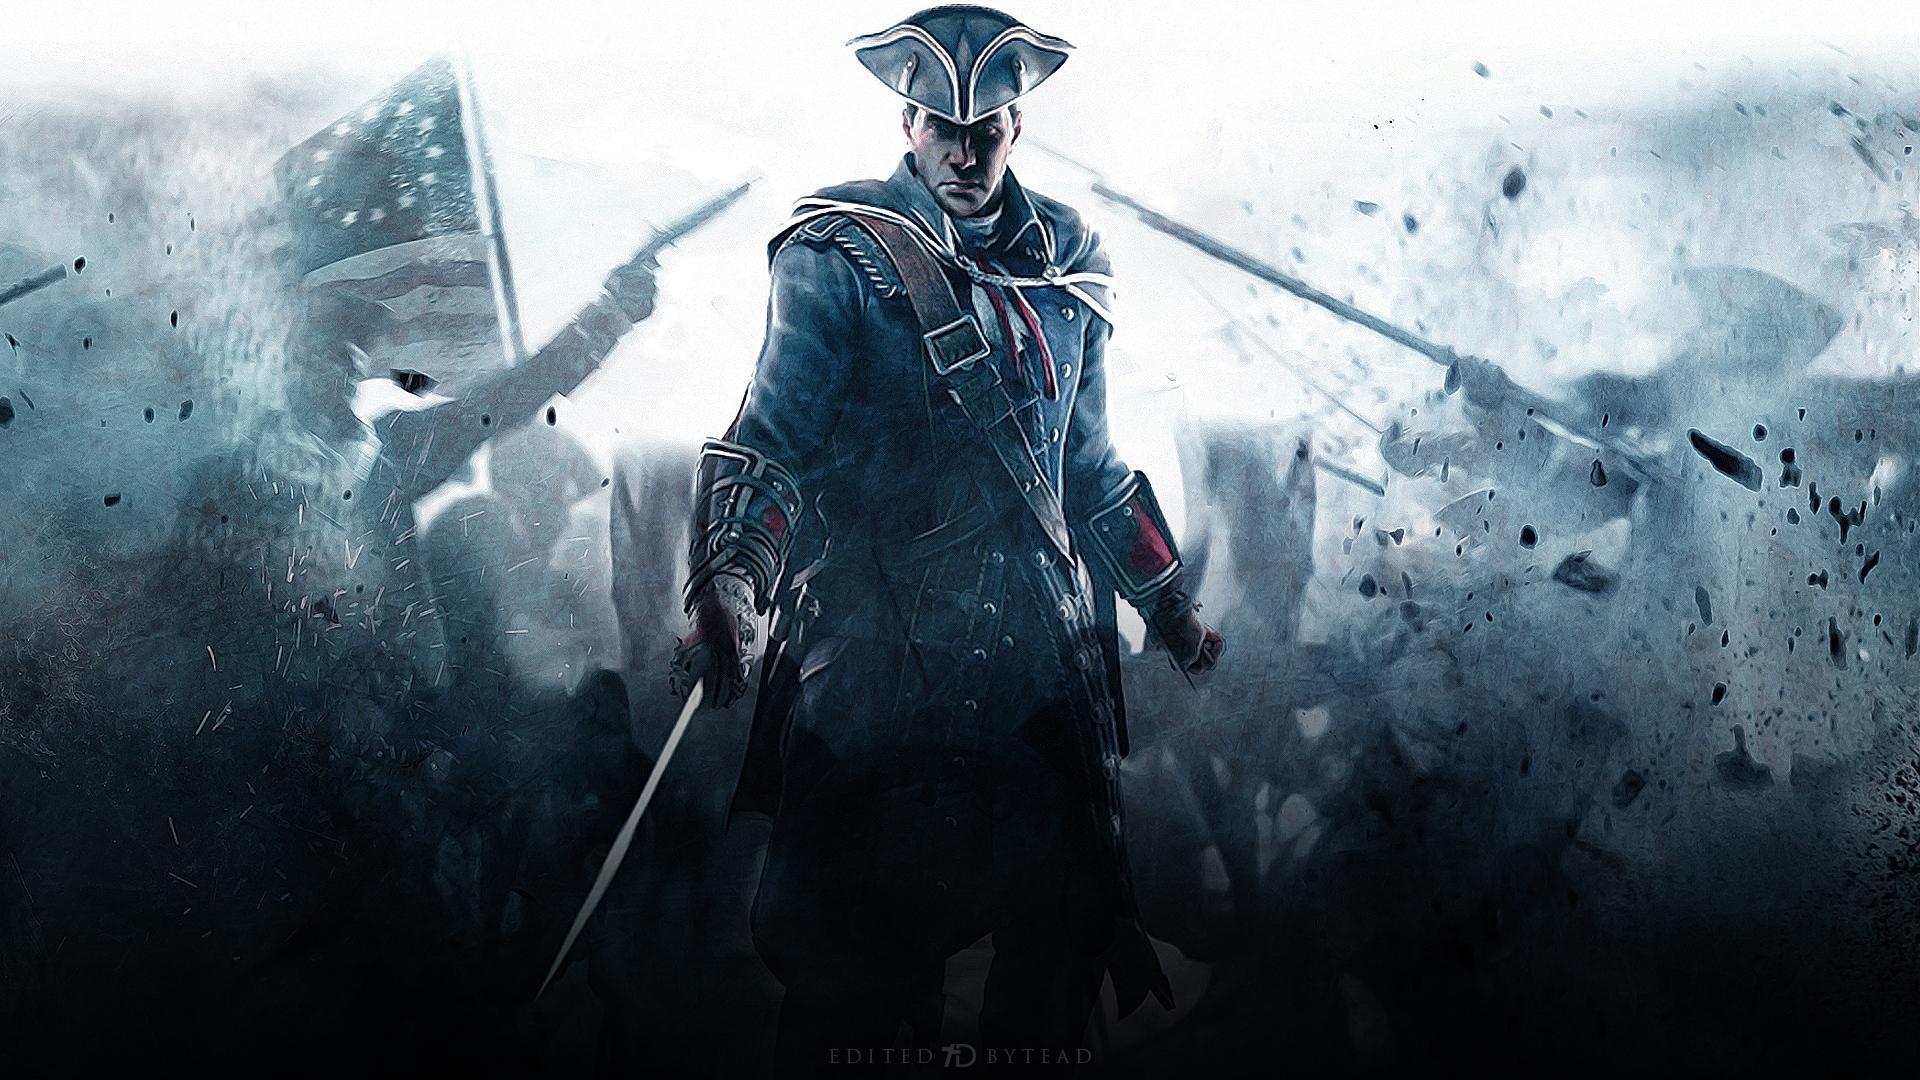 Assassin's Creed 3 Haytham